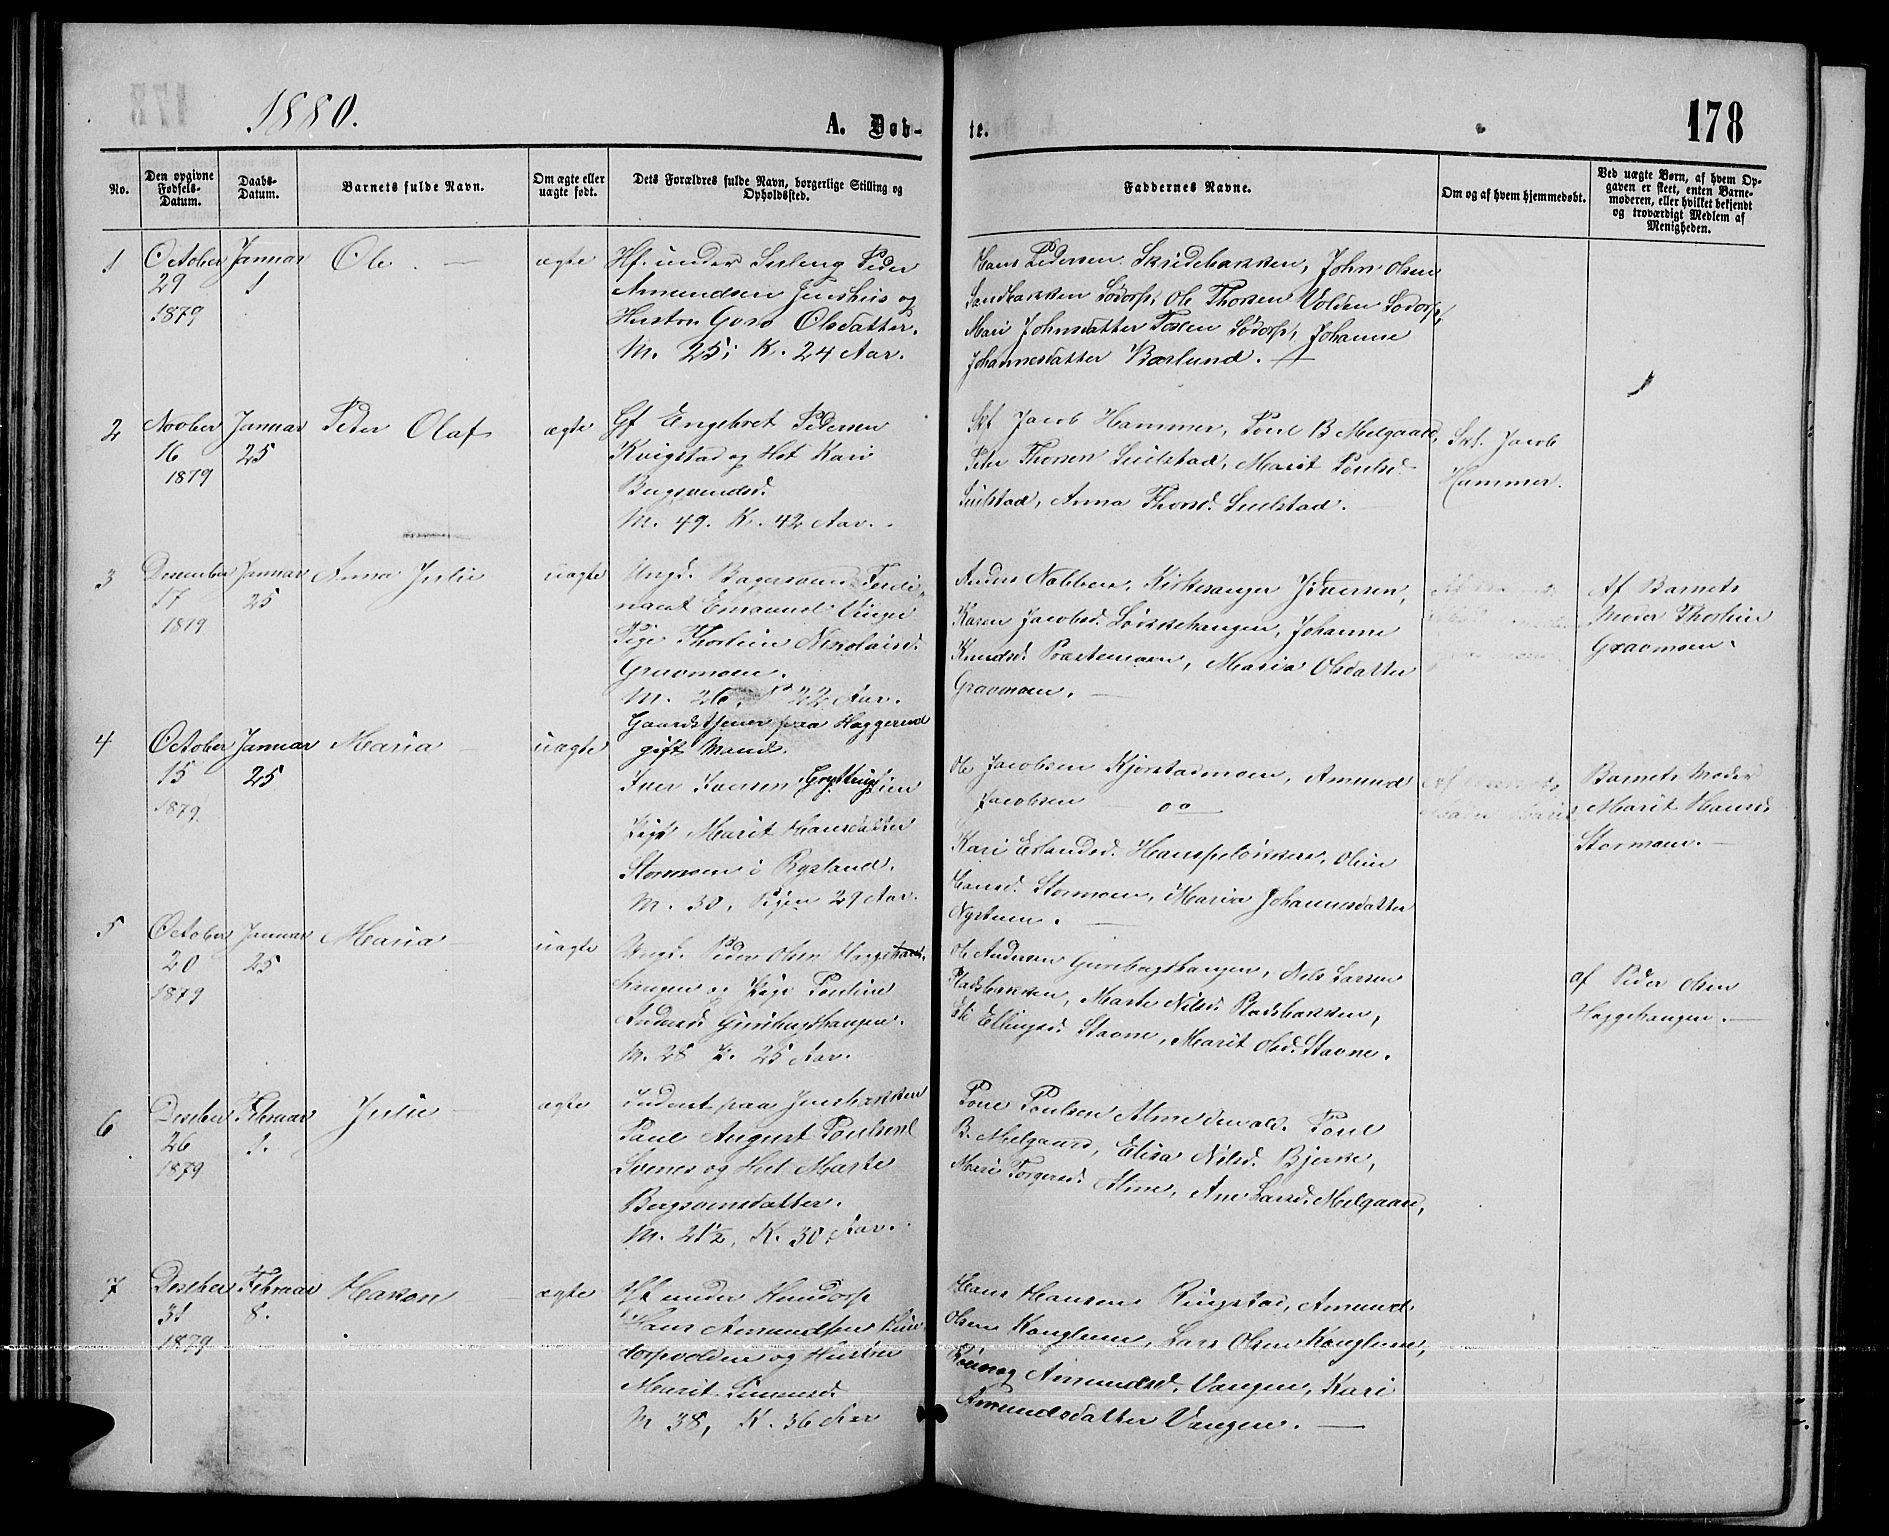 SAH, Sør-Fron prestekontor, H/Ha/Hab/L0002: Klokkerbok nr. 2, 1864-1883, s. 178